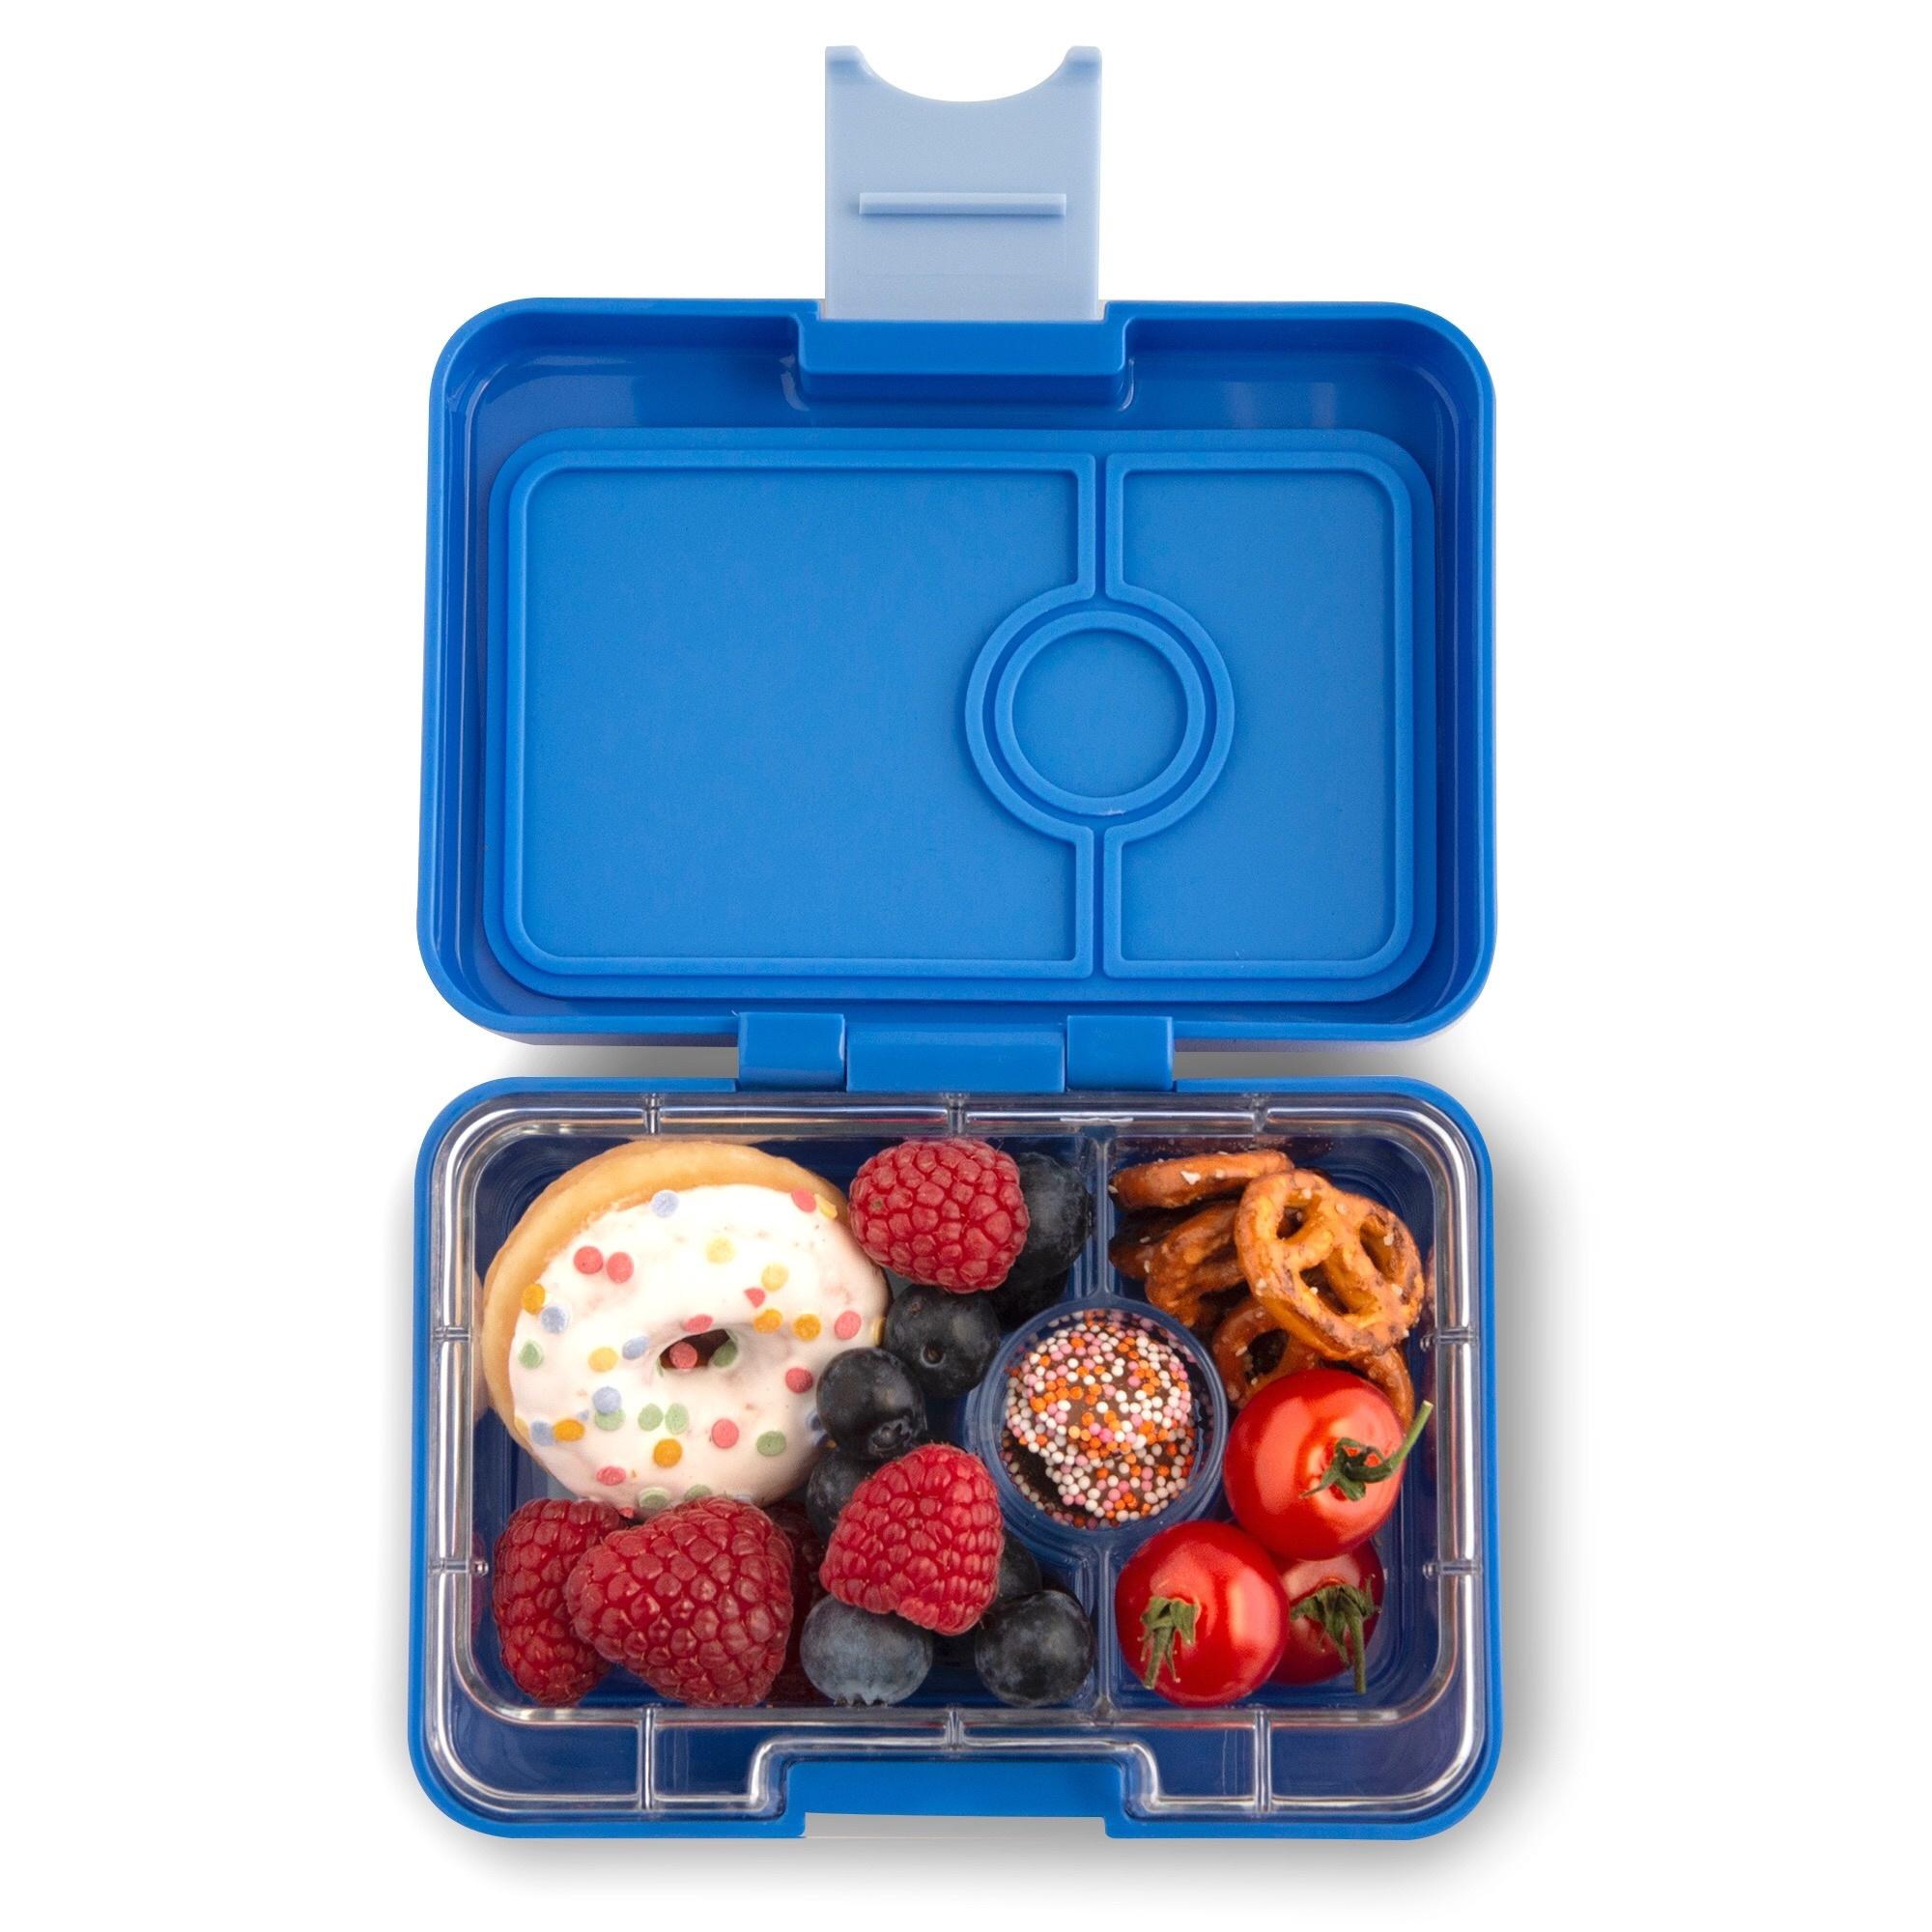 Yumbox MiniSnack 3-sections True Blue (Jodphur blue) / Toucan tray-2